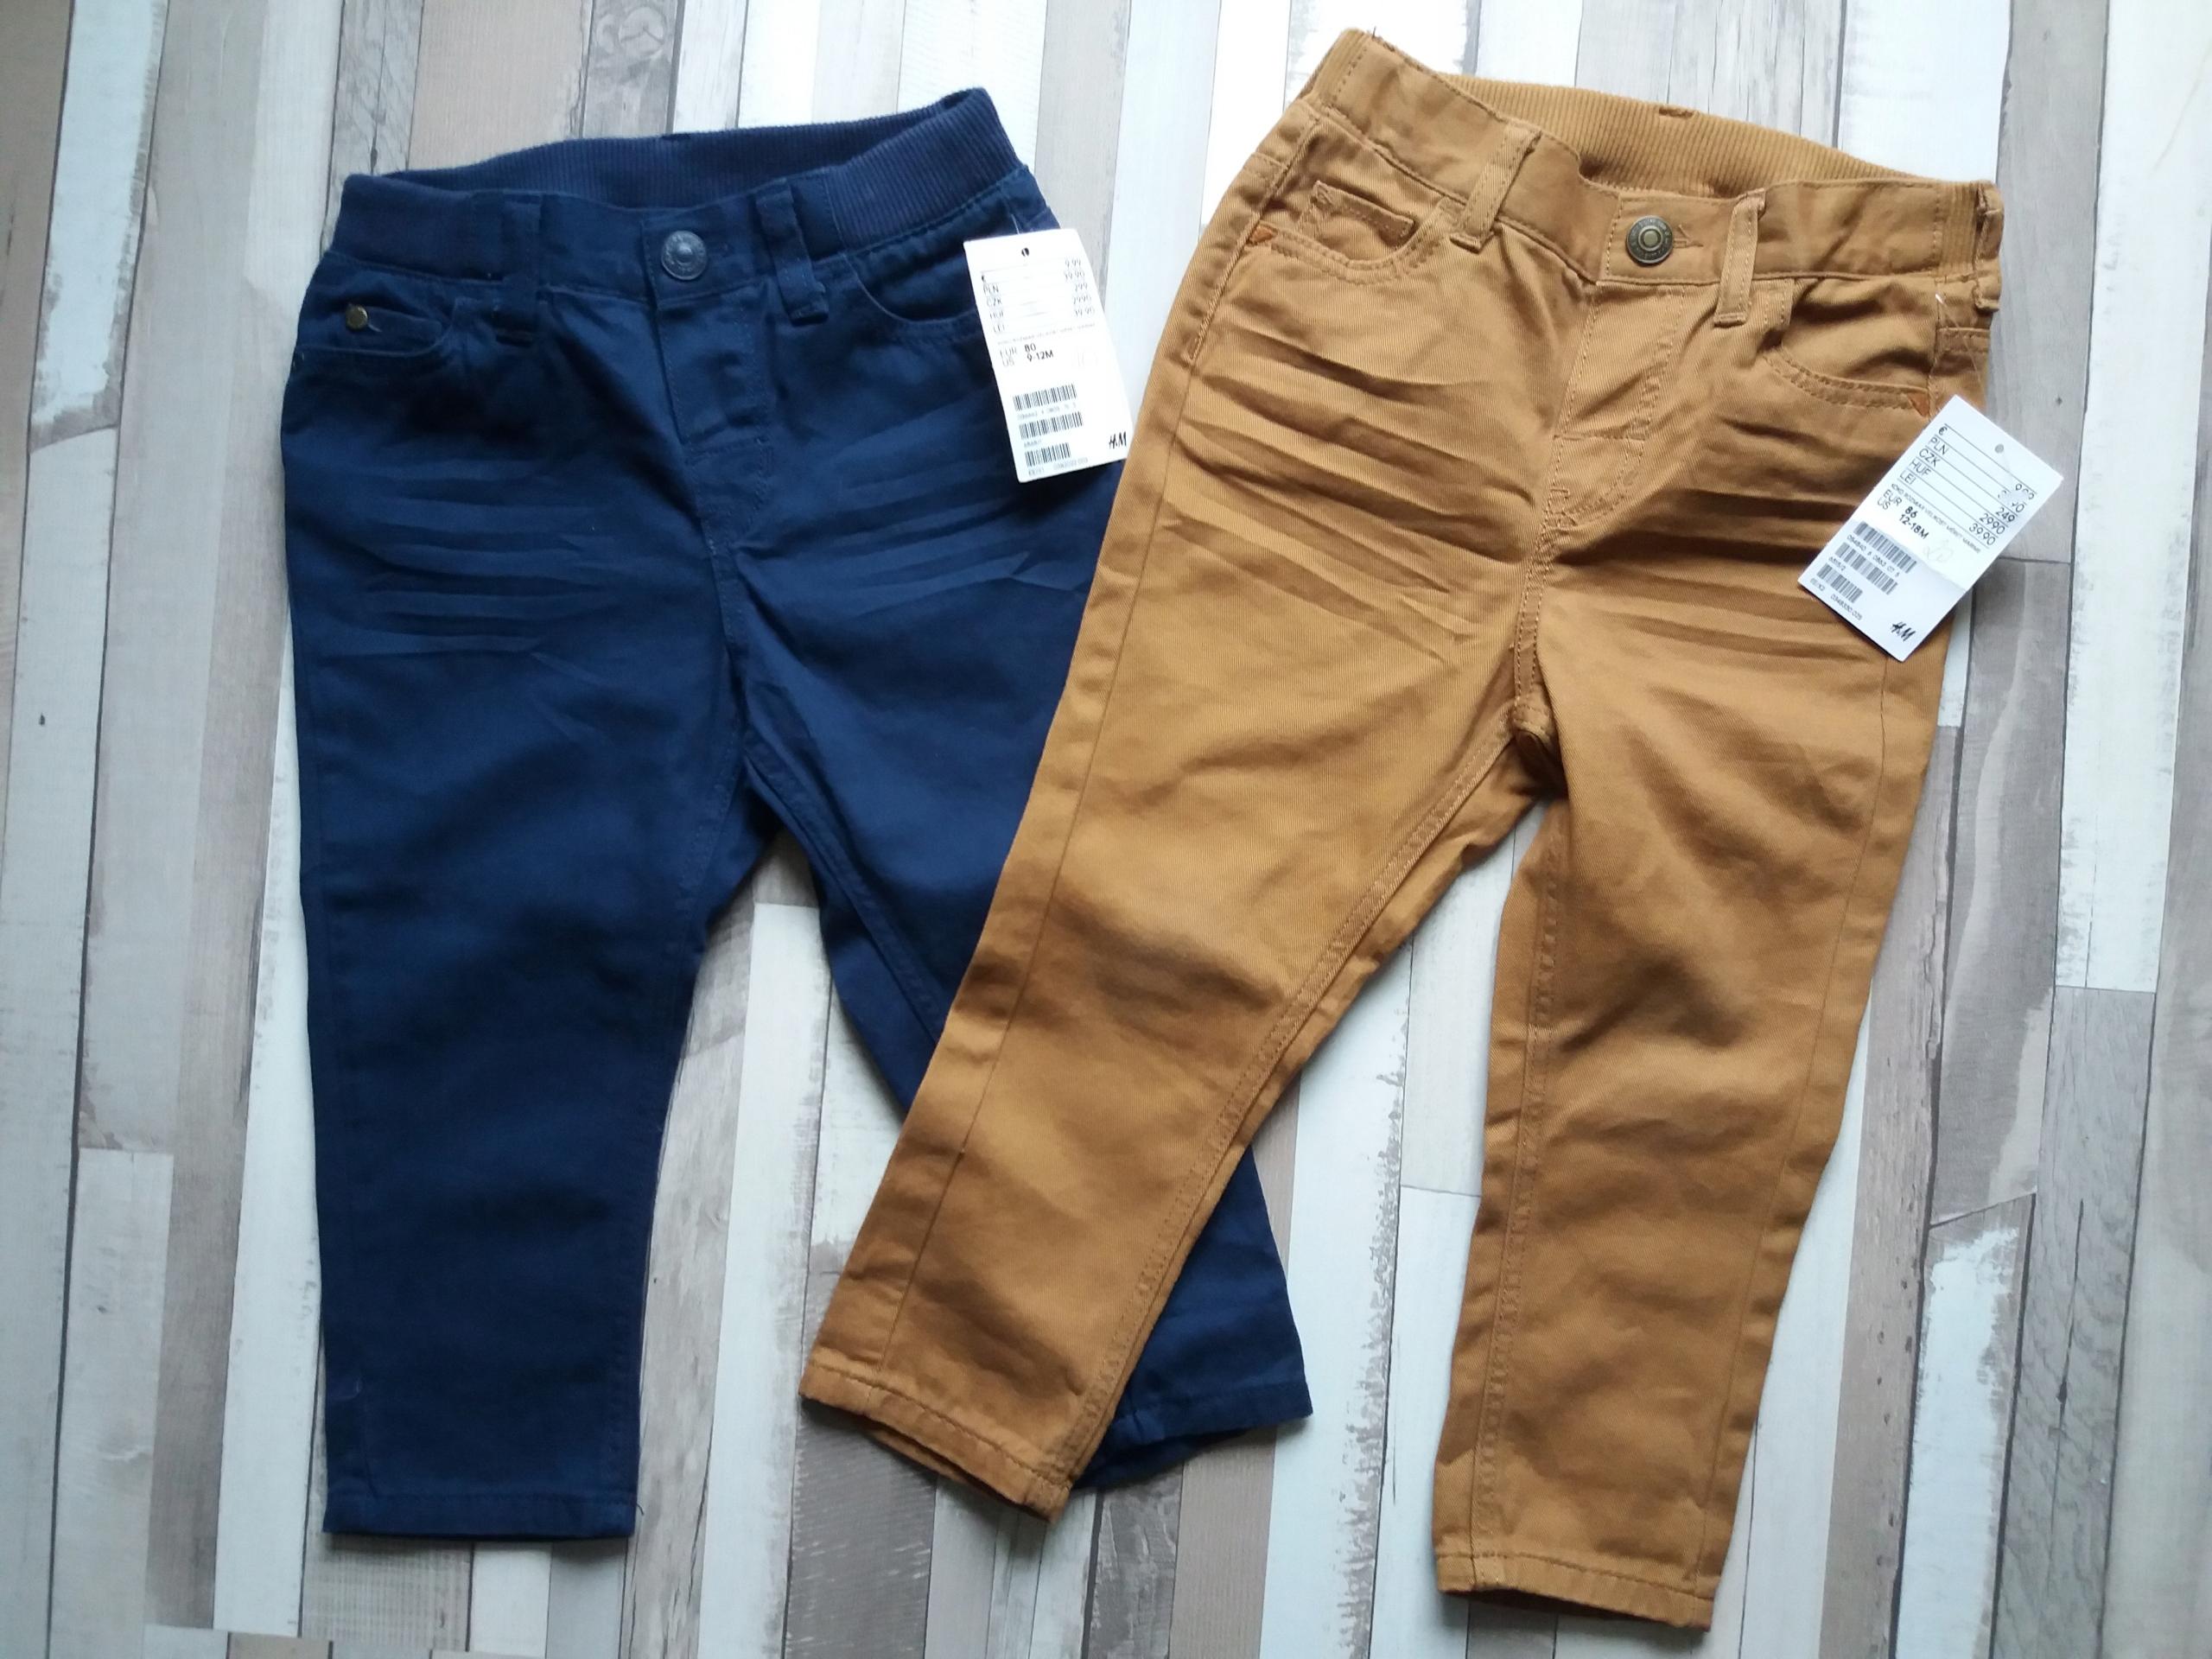 NOWE 2 pary spodnie marki h&m r. 80 i r.86